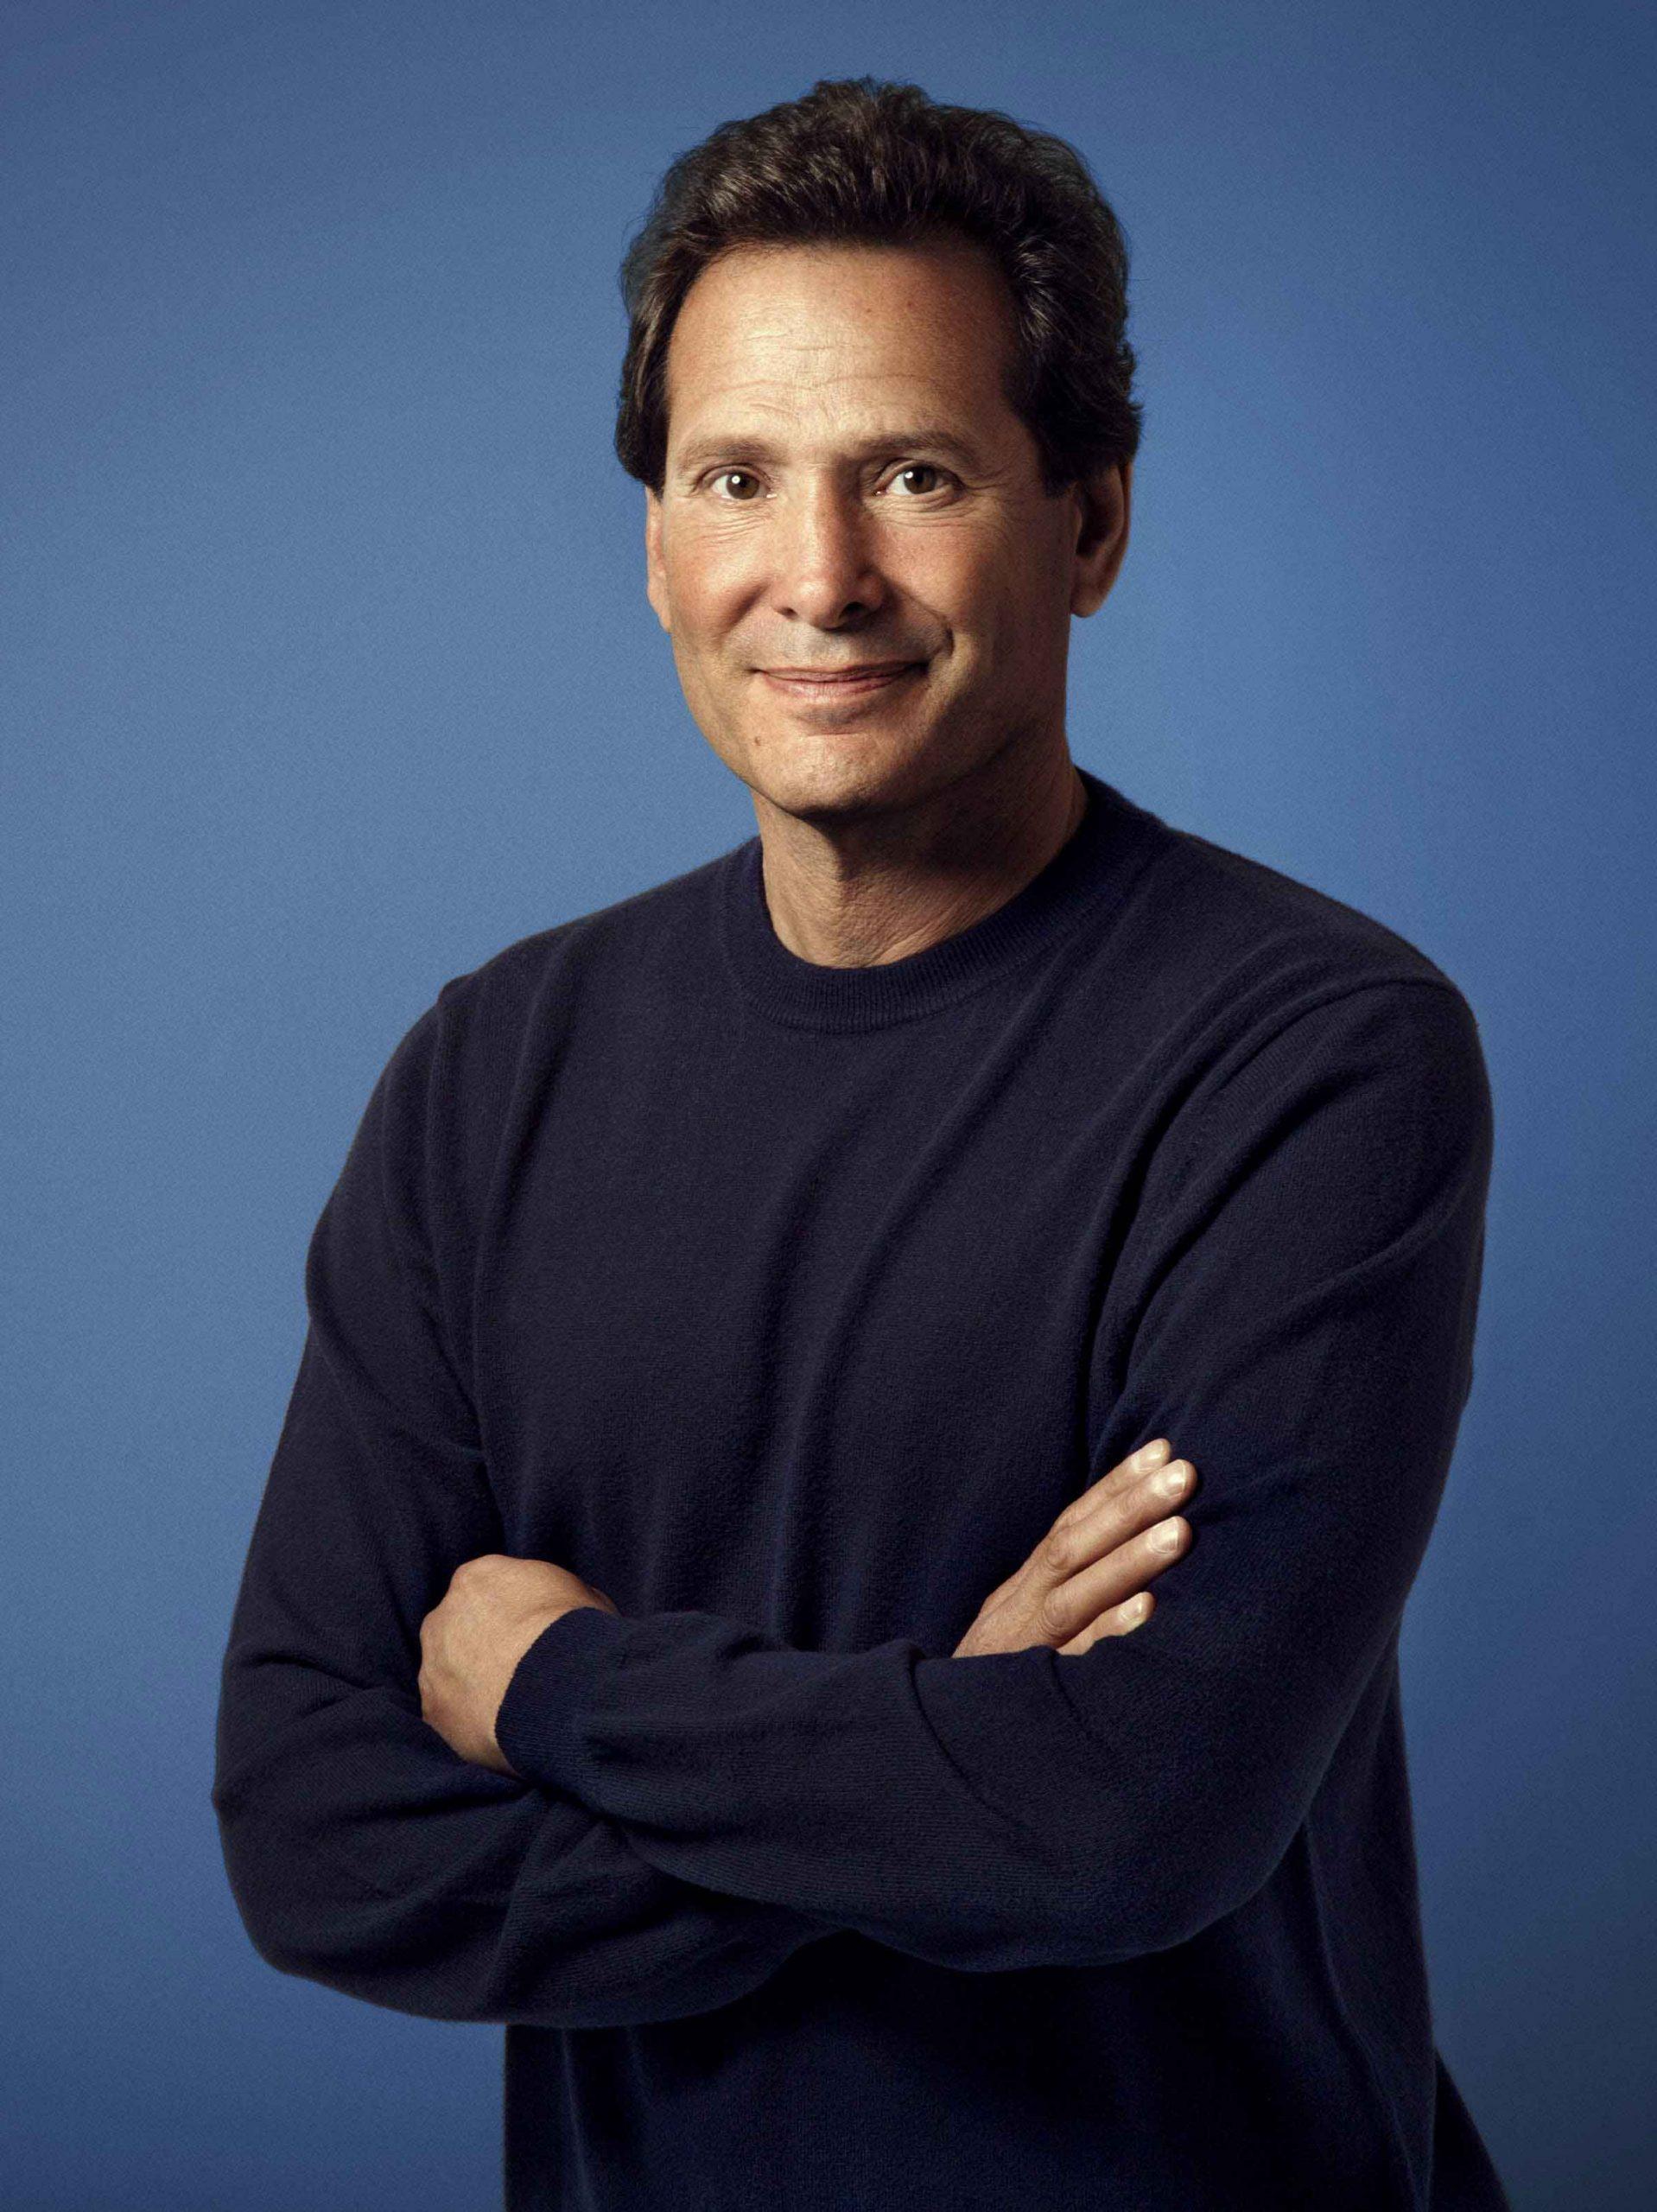 Dan Schulman, PayPal President & CEO